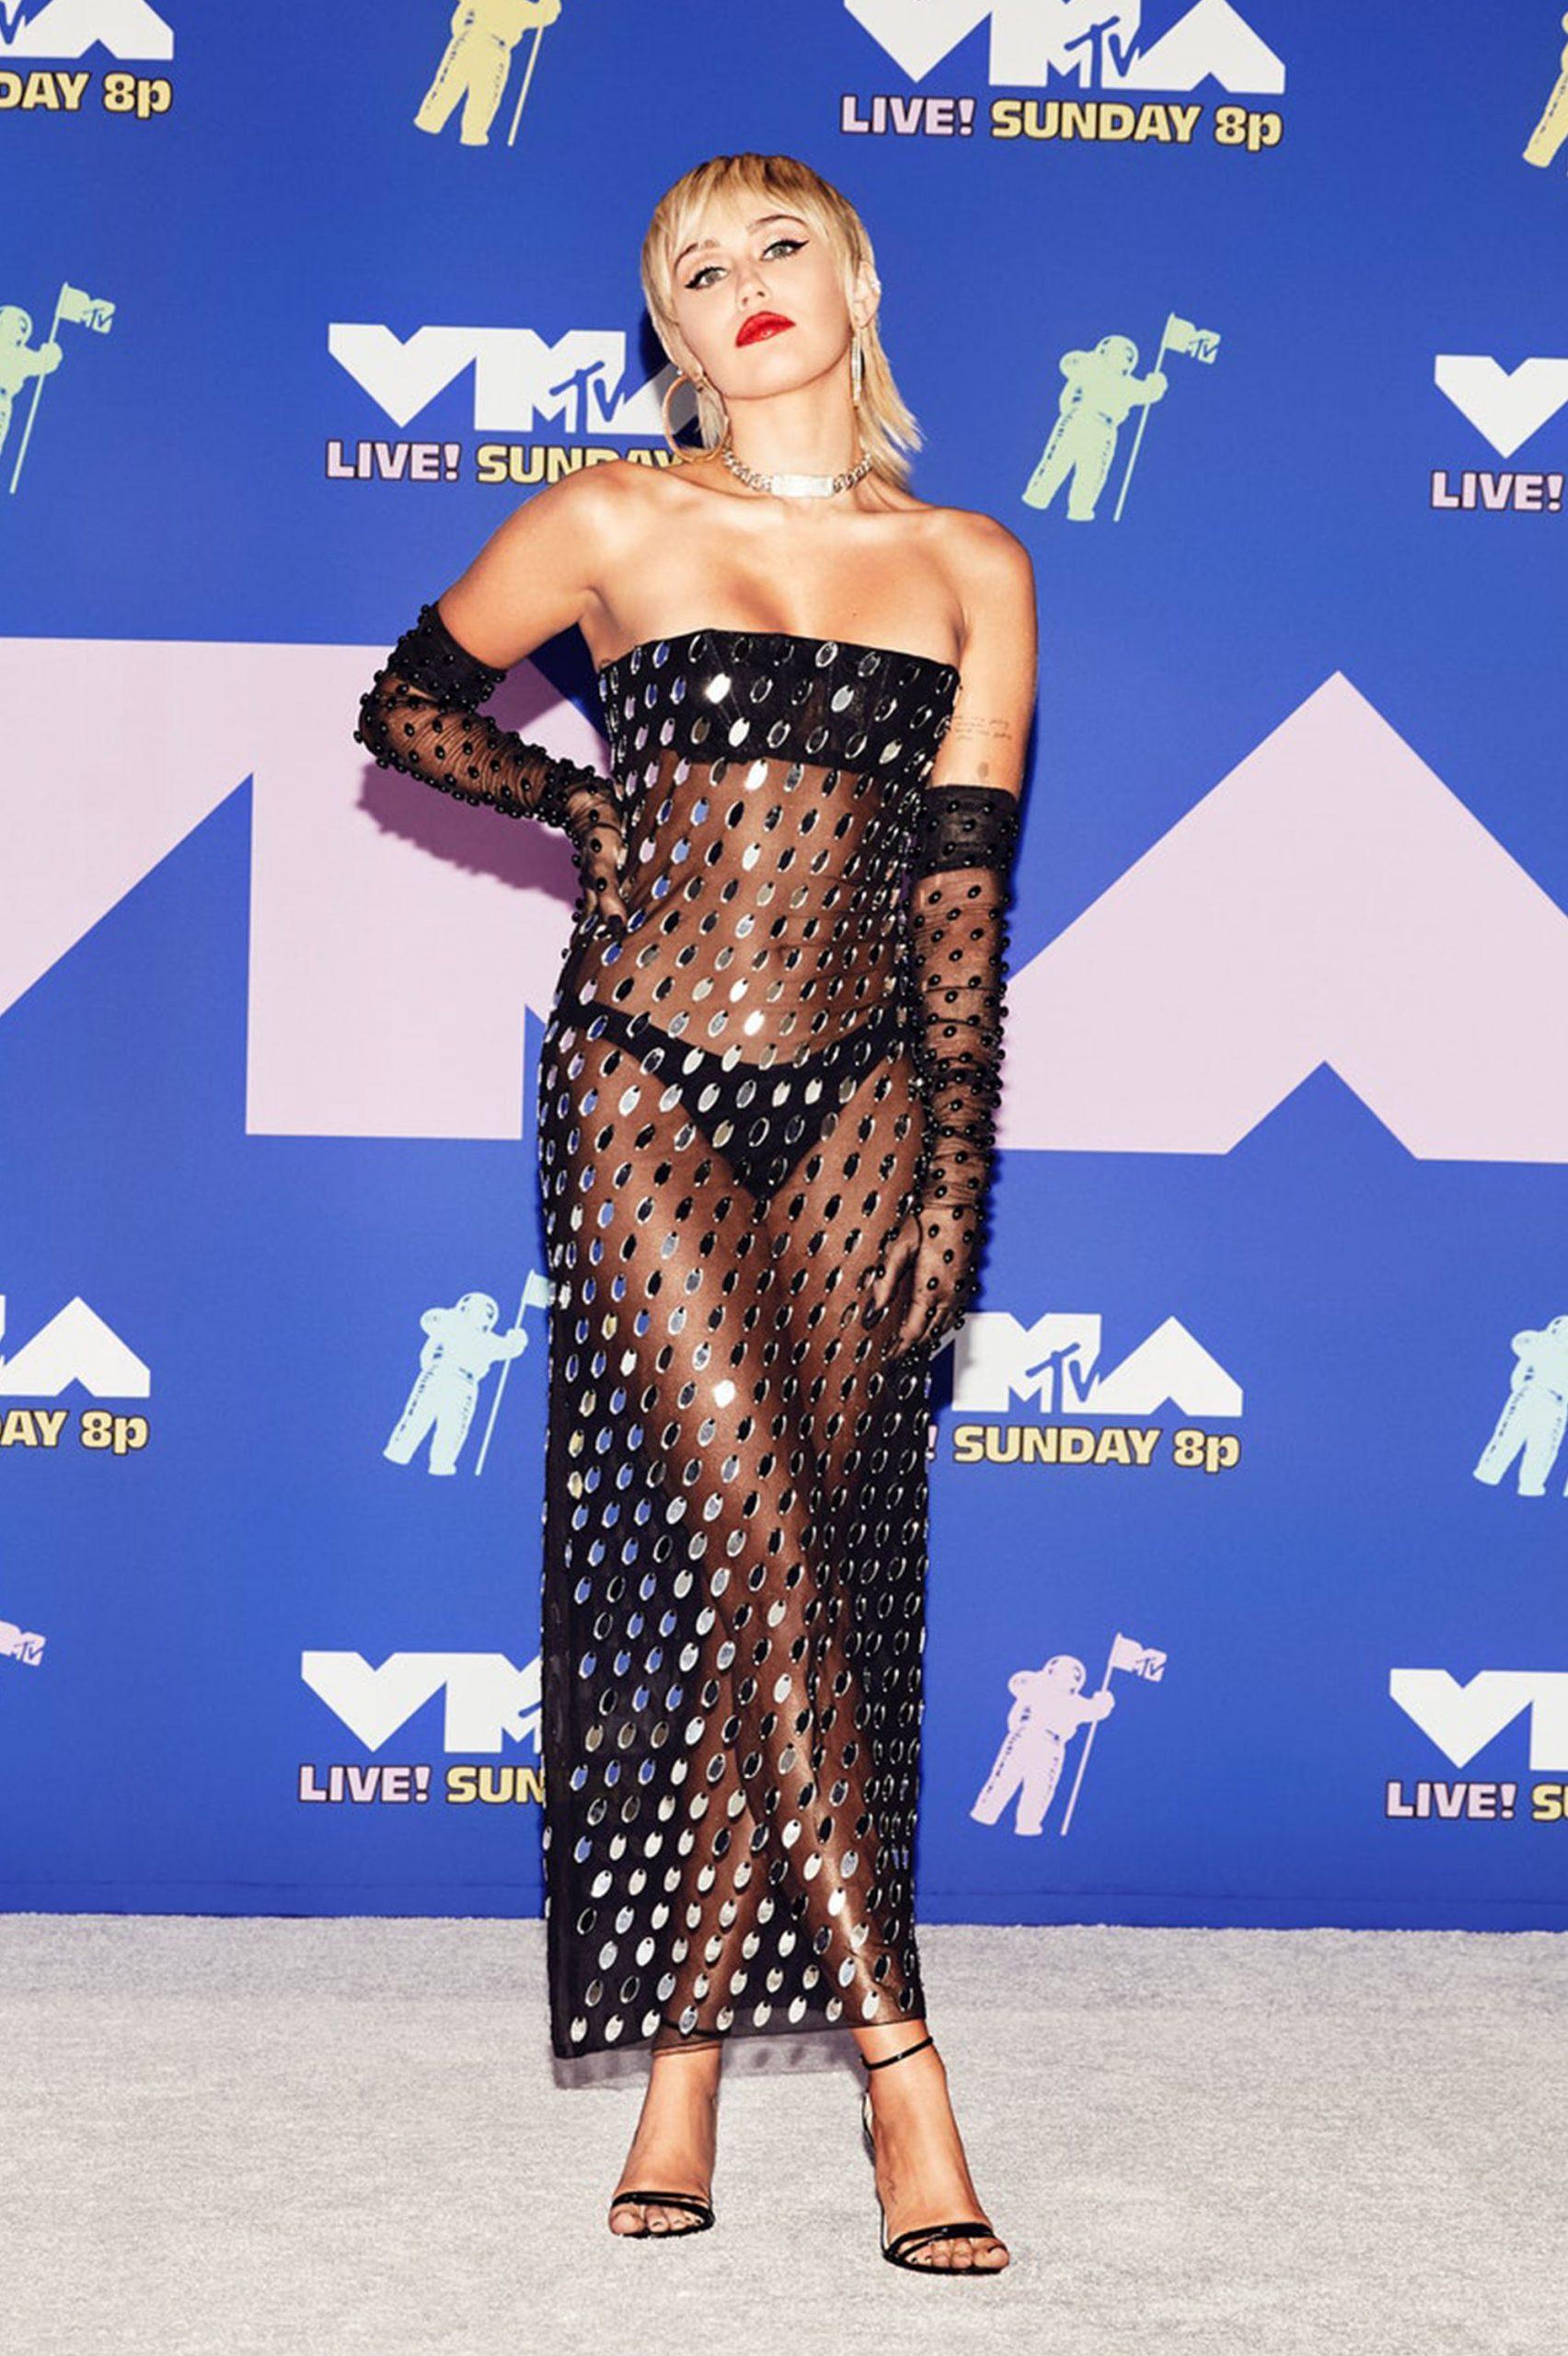 Miley naked dress - Neomag.